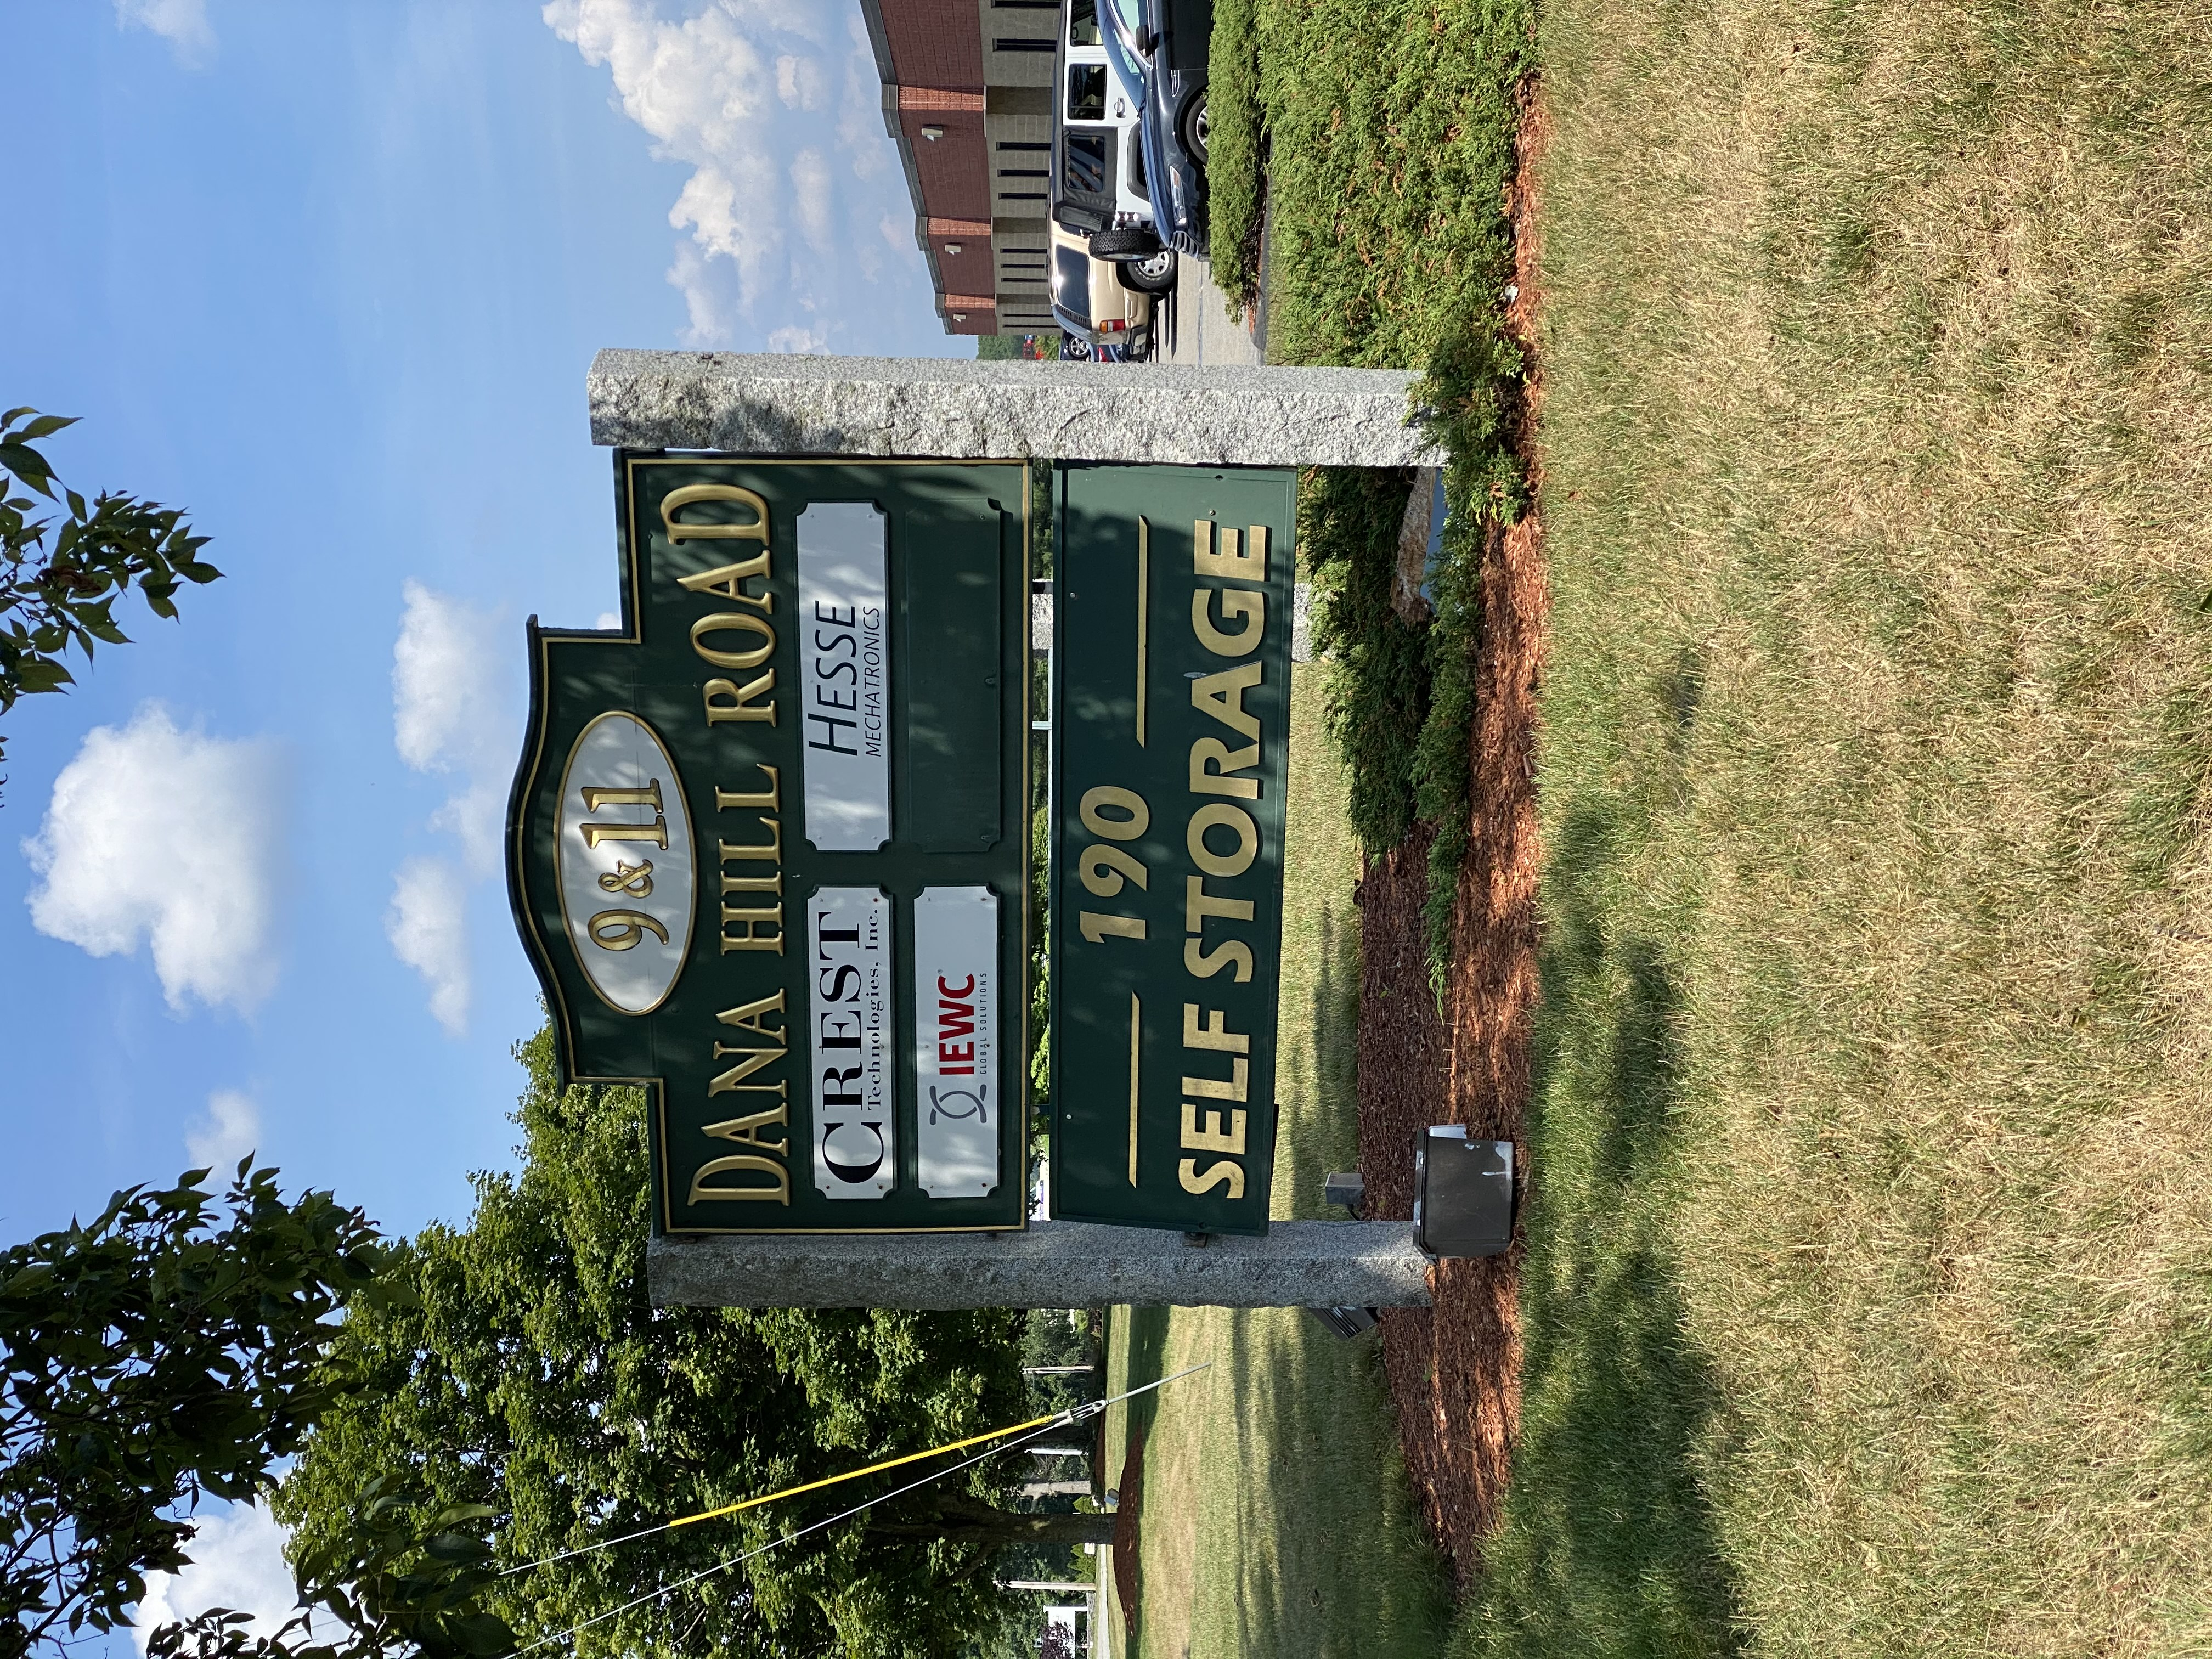 190 Storage Road Sign